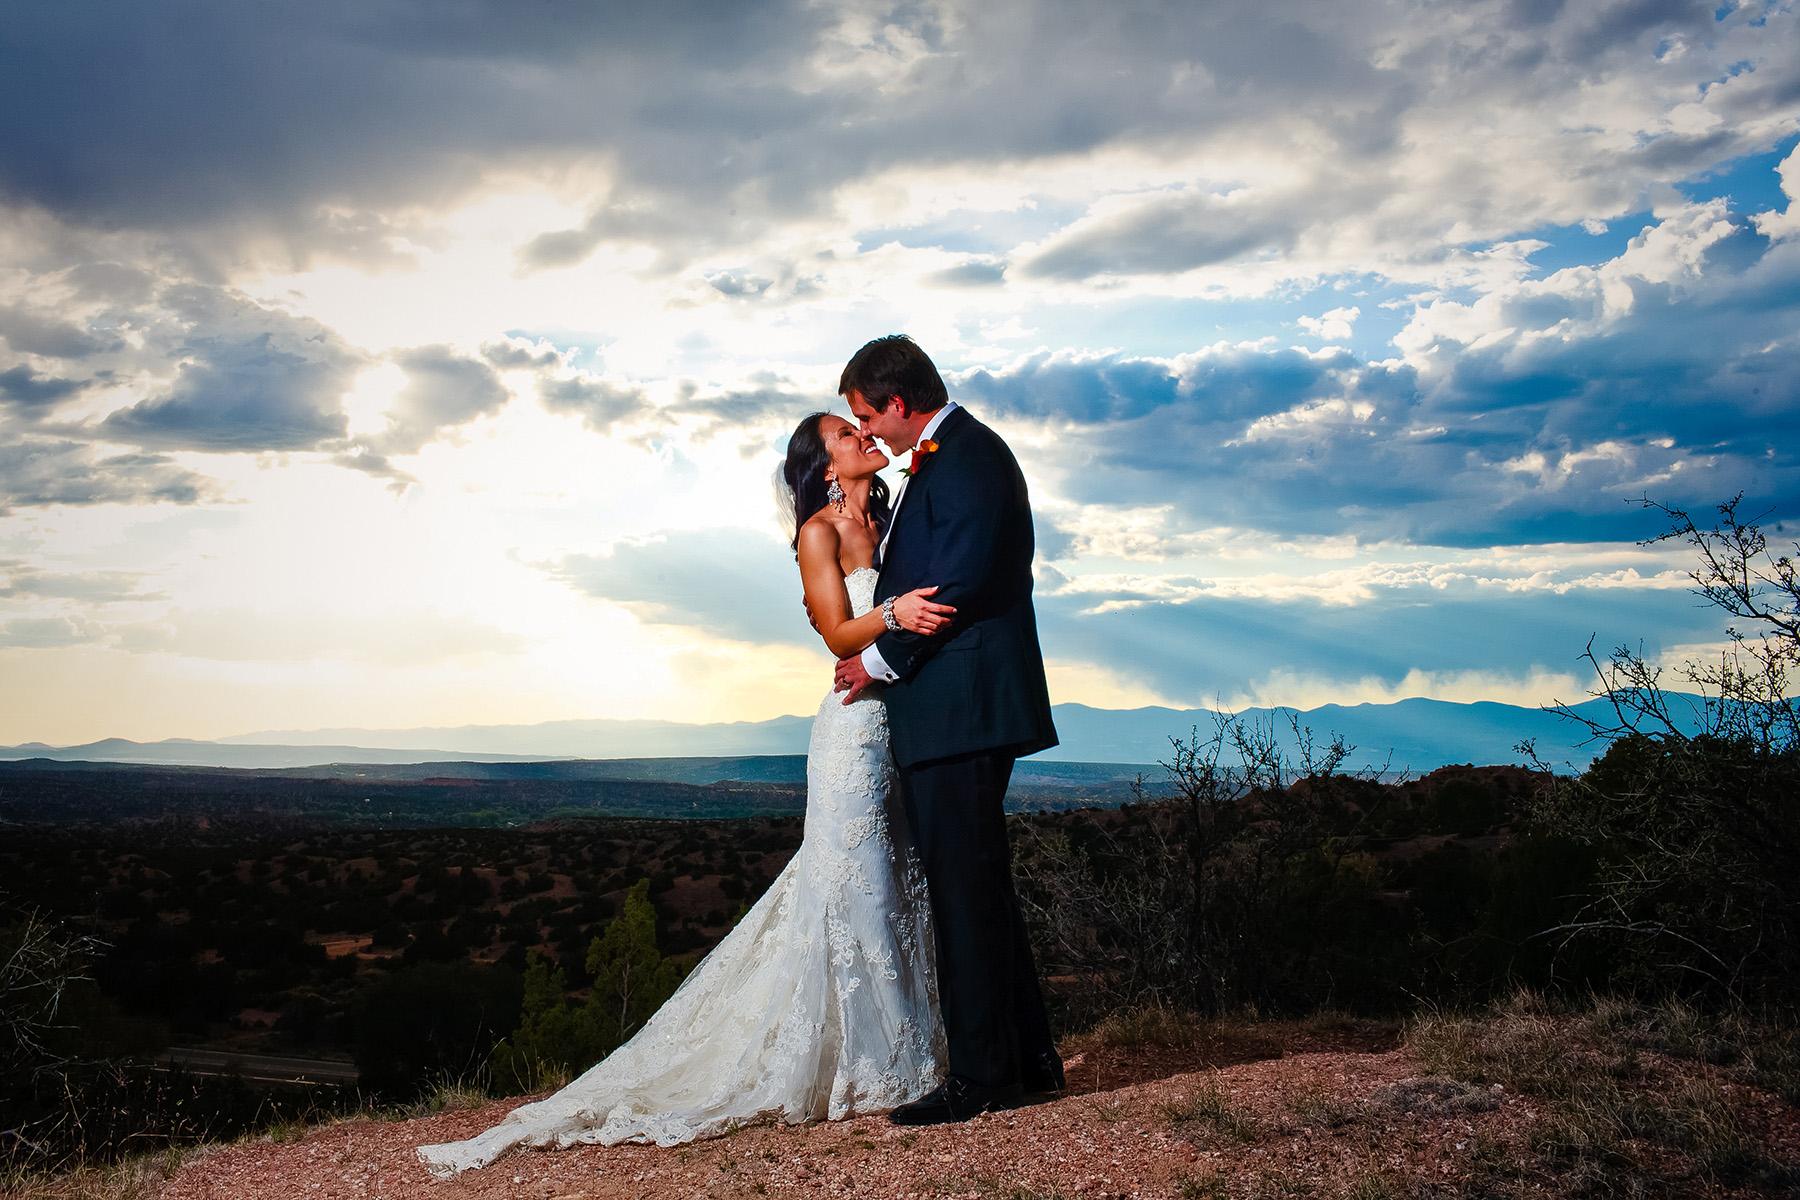 Tabitha-Dallas-wedding-four-seasons-resort-rancho-encantado-santa-fe-new-mexico-1056